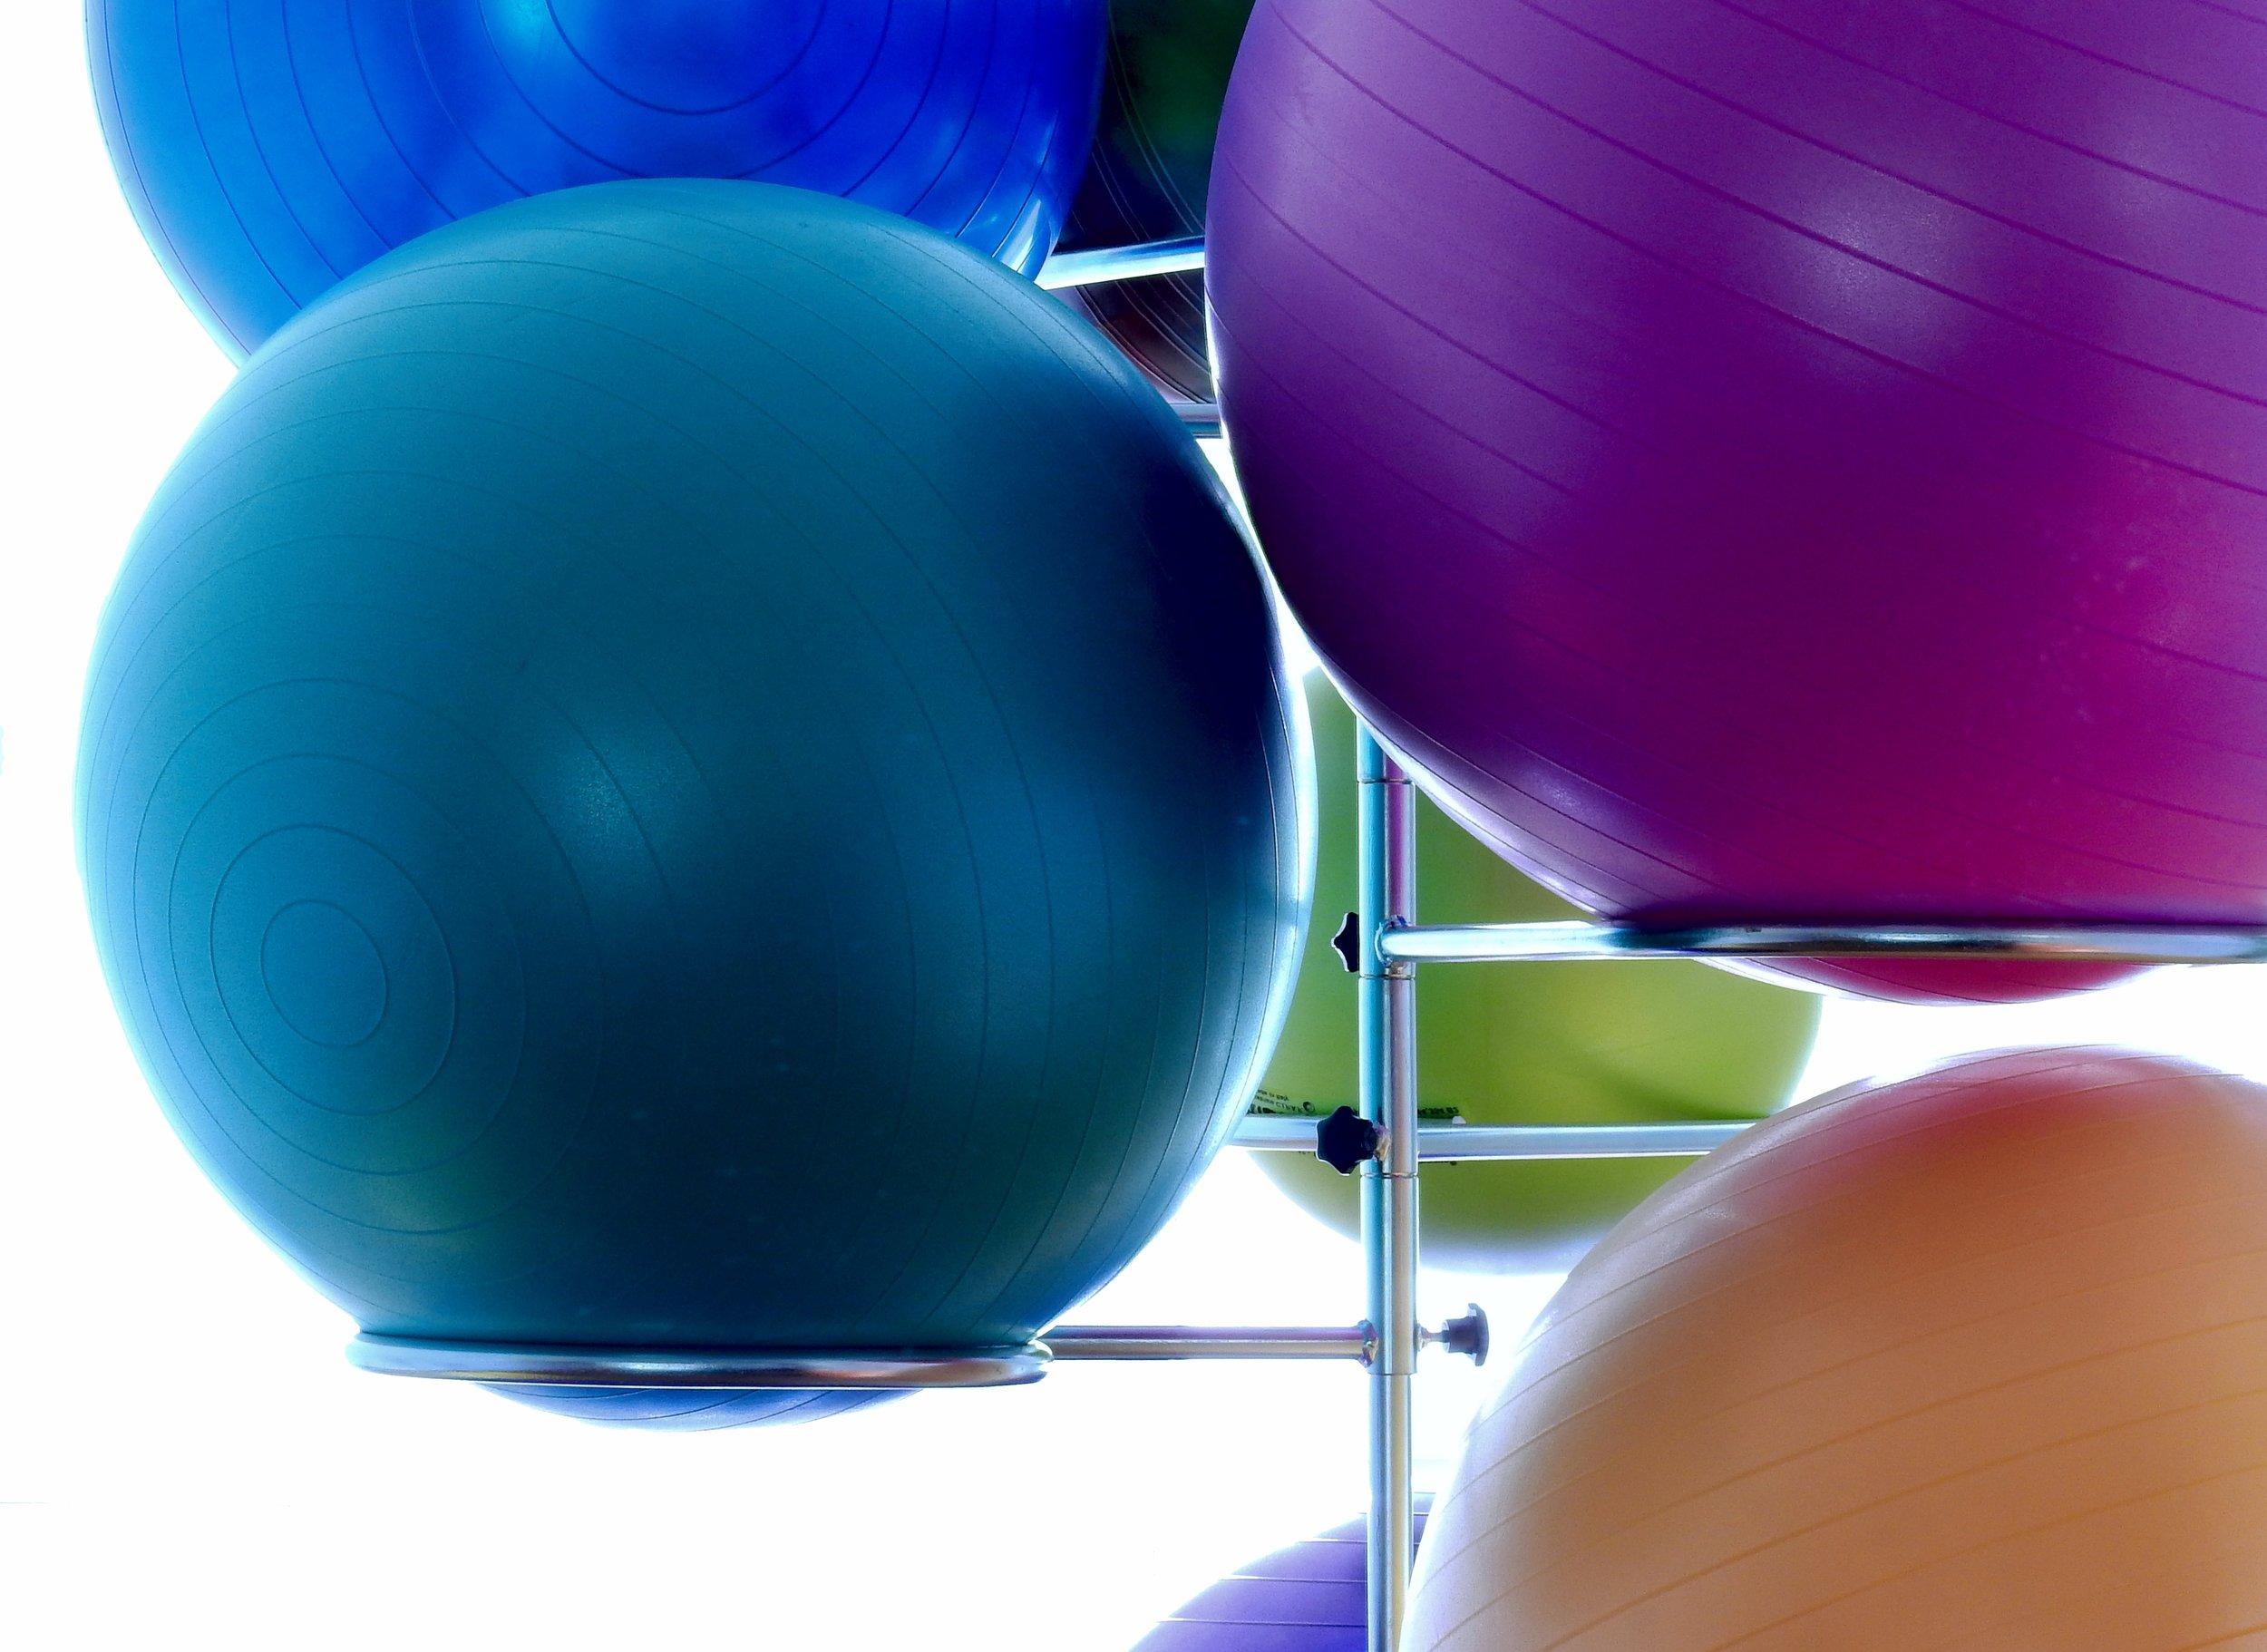 medicine-ball-ball-gymnastics-exercise-ball-159638.jpeg